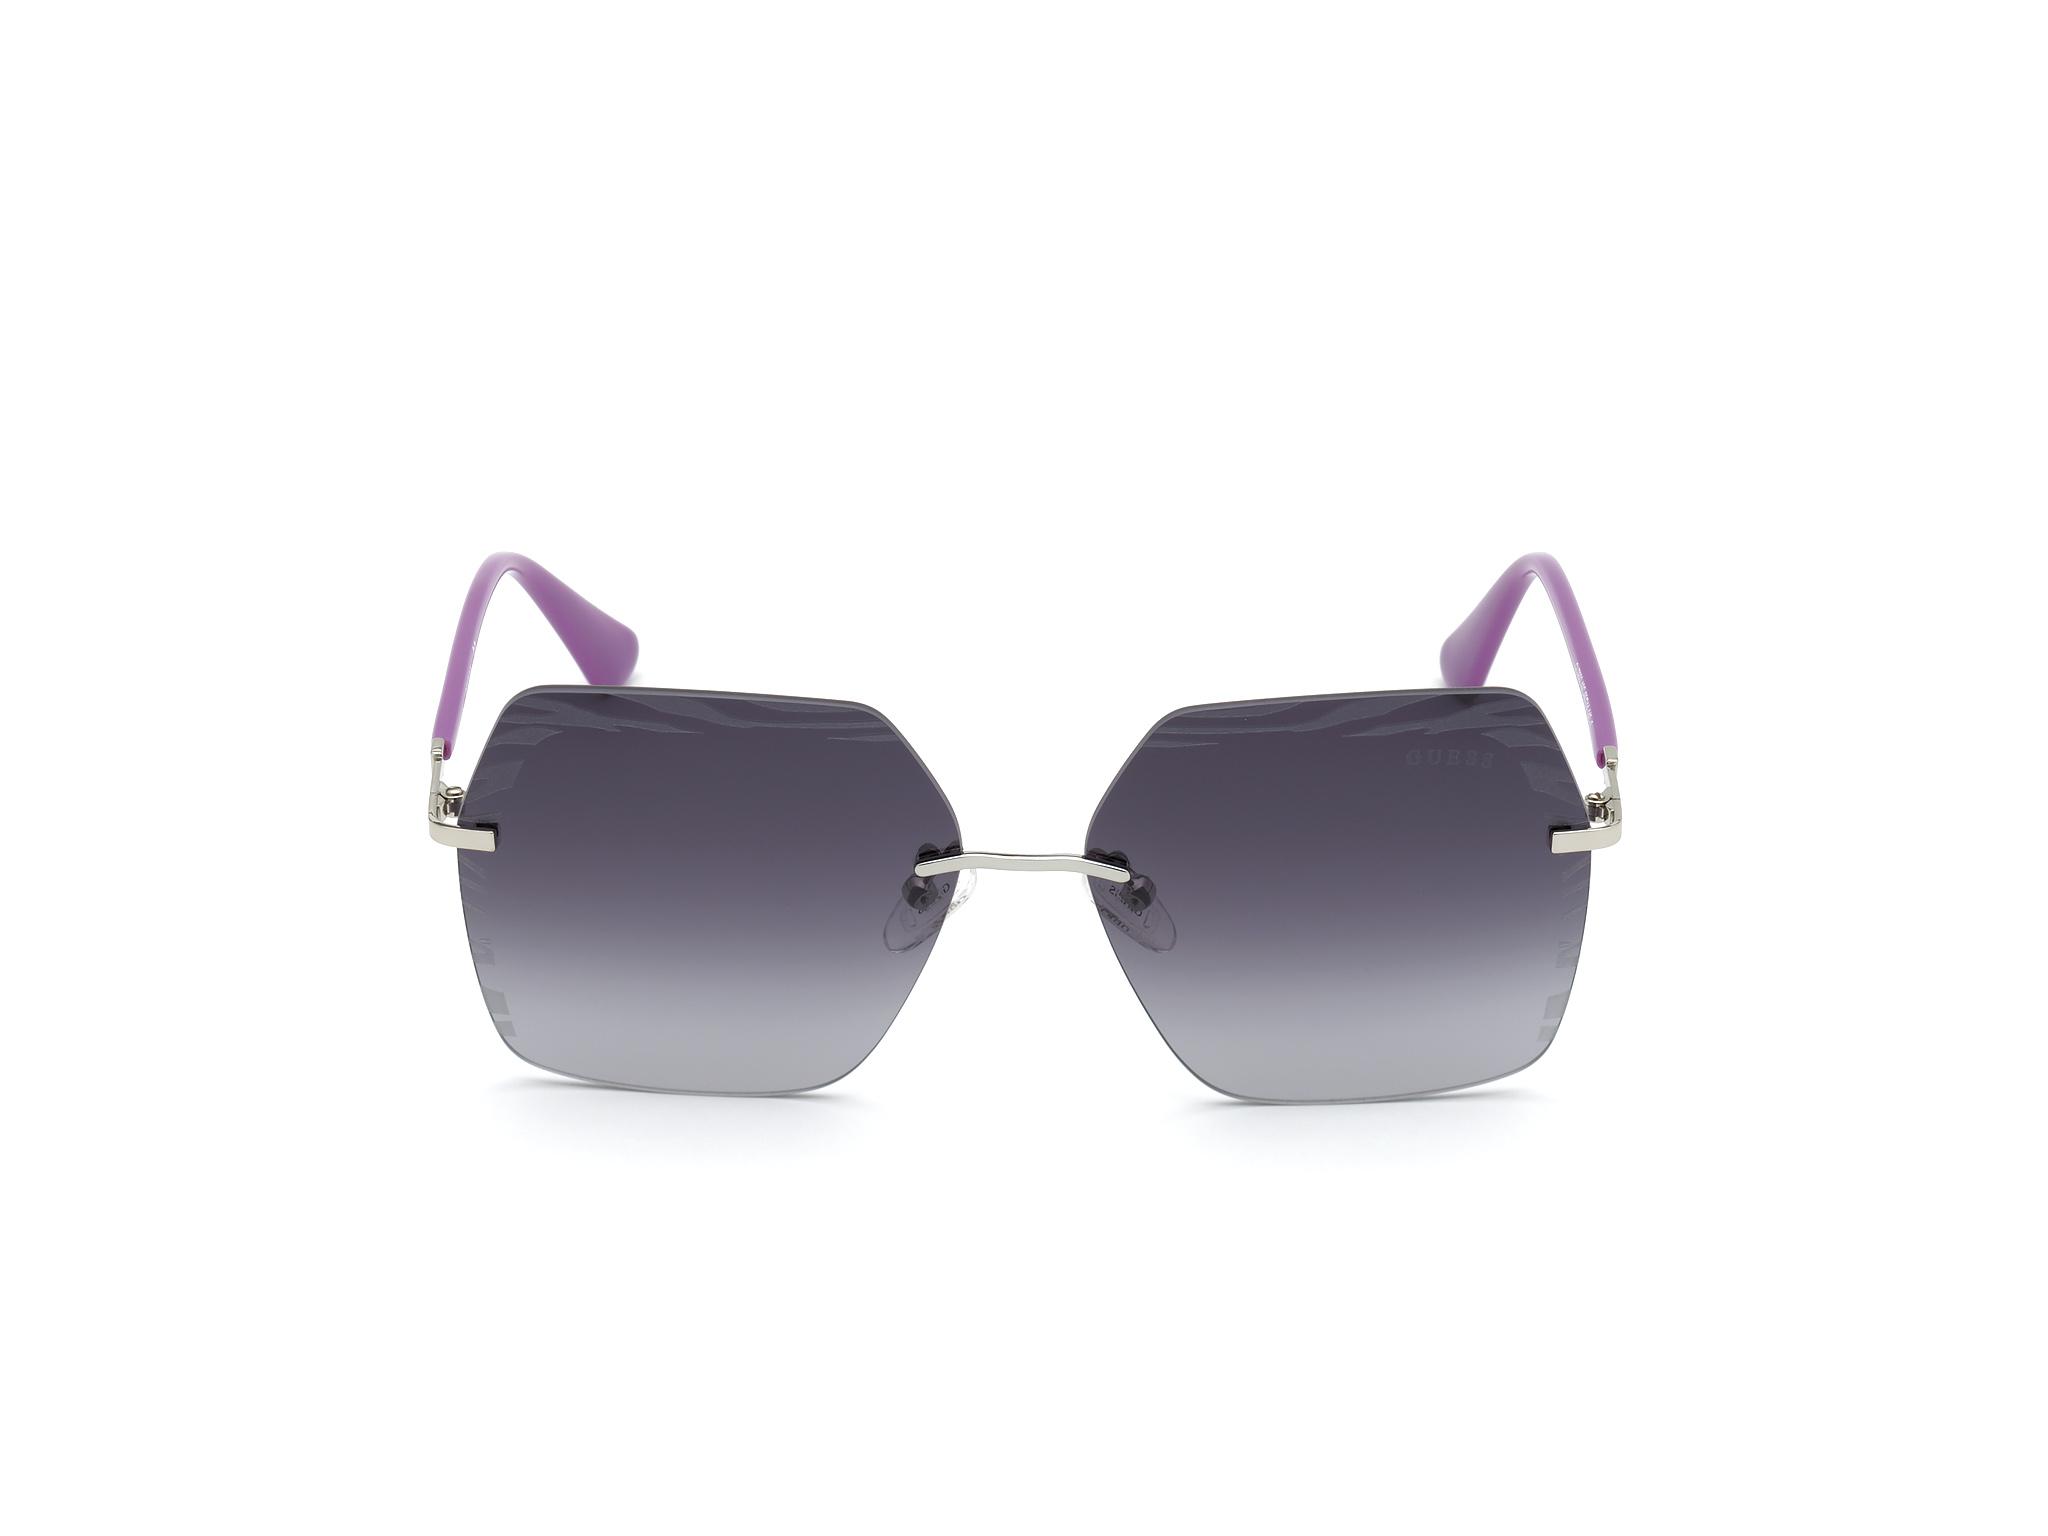 GUESS | Guess Silver Frame With Grey Lens Shield Shape Women Sunglass